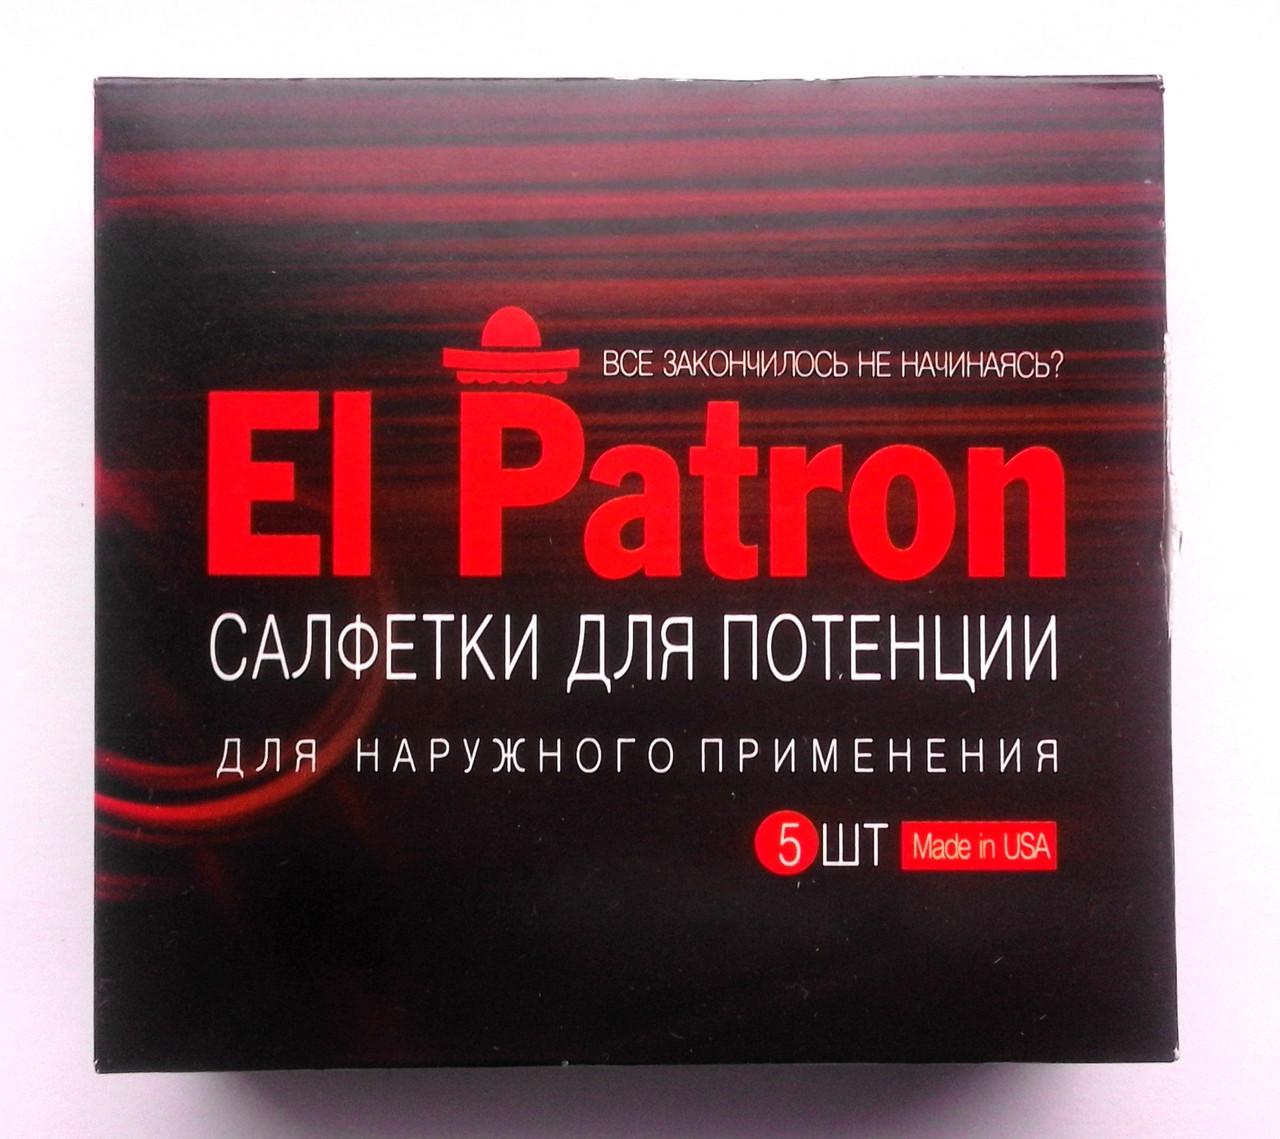 El Patron - салфетки для потенции (Эль Патрон)